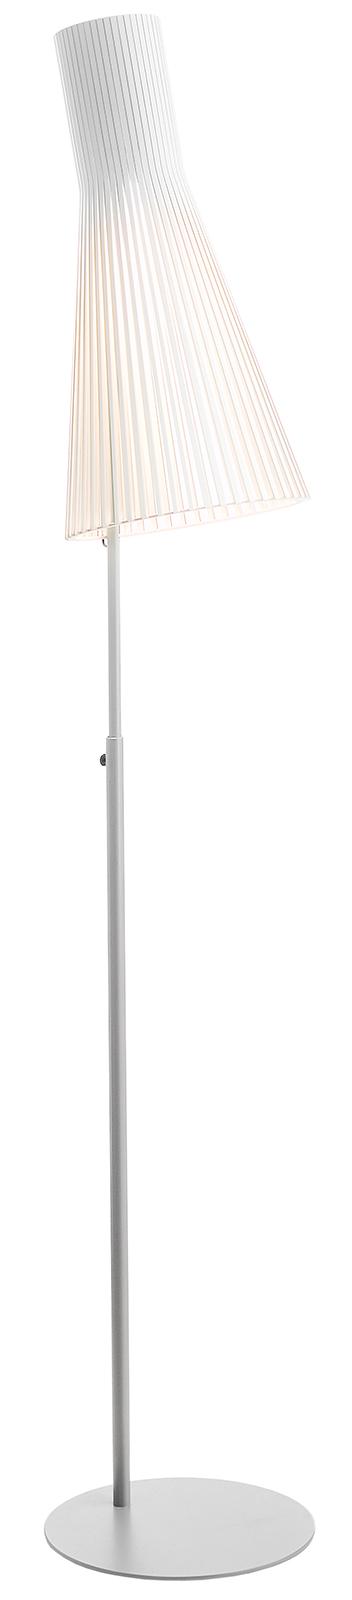 Secto 4210 42W E27 h=175-185cm põrandavalgusti, valge kasespoon